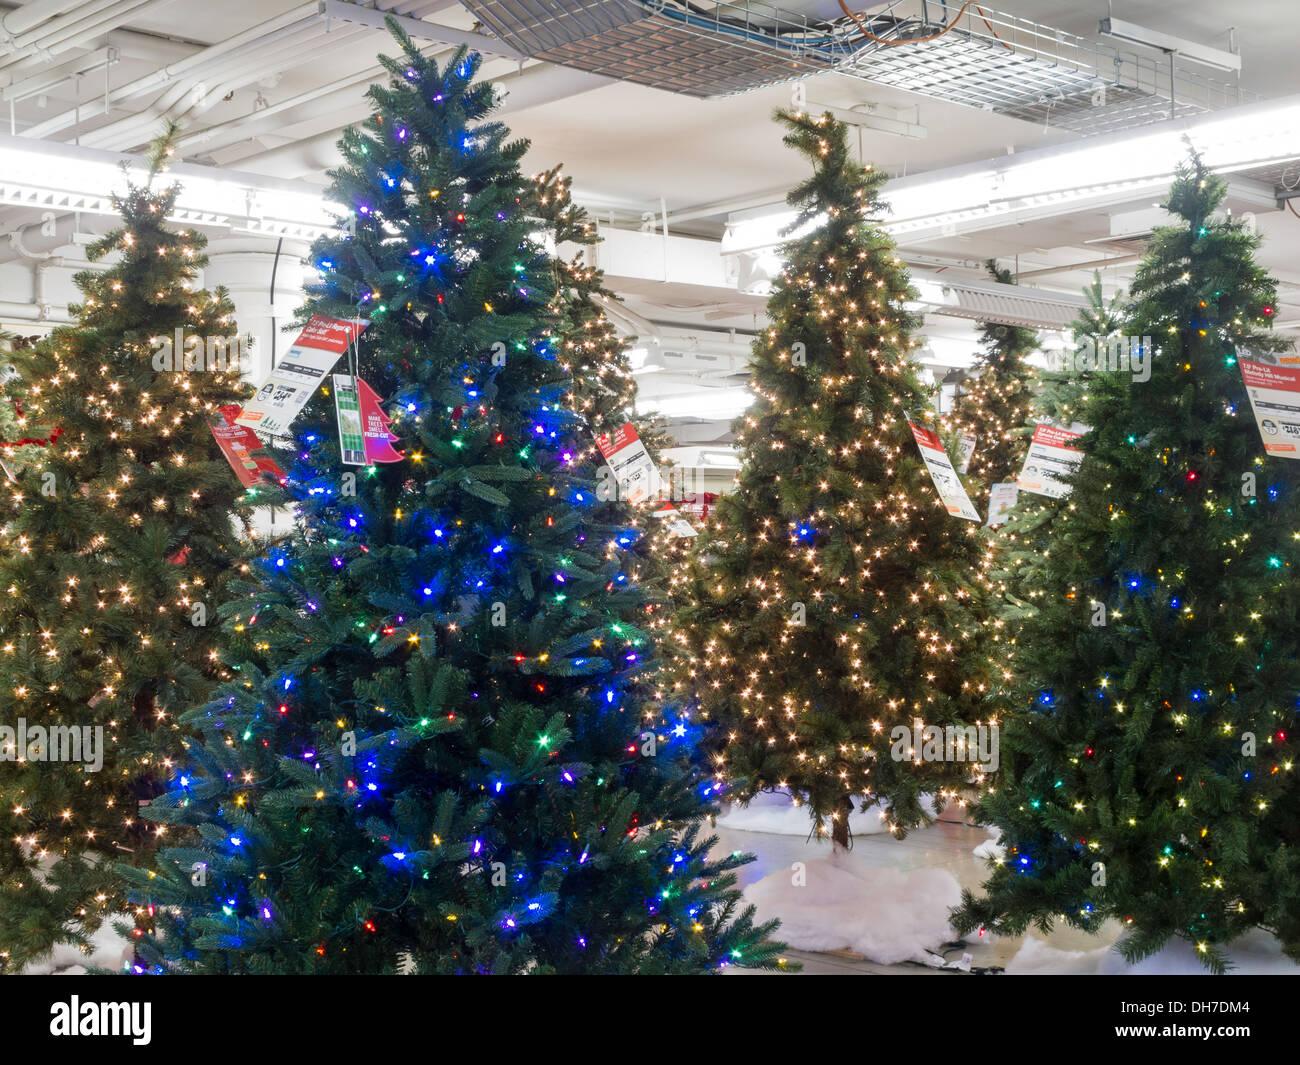 Home Depot Store Christmas Stock Photos & Home Depot Store ...